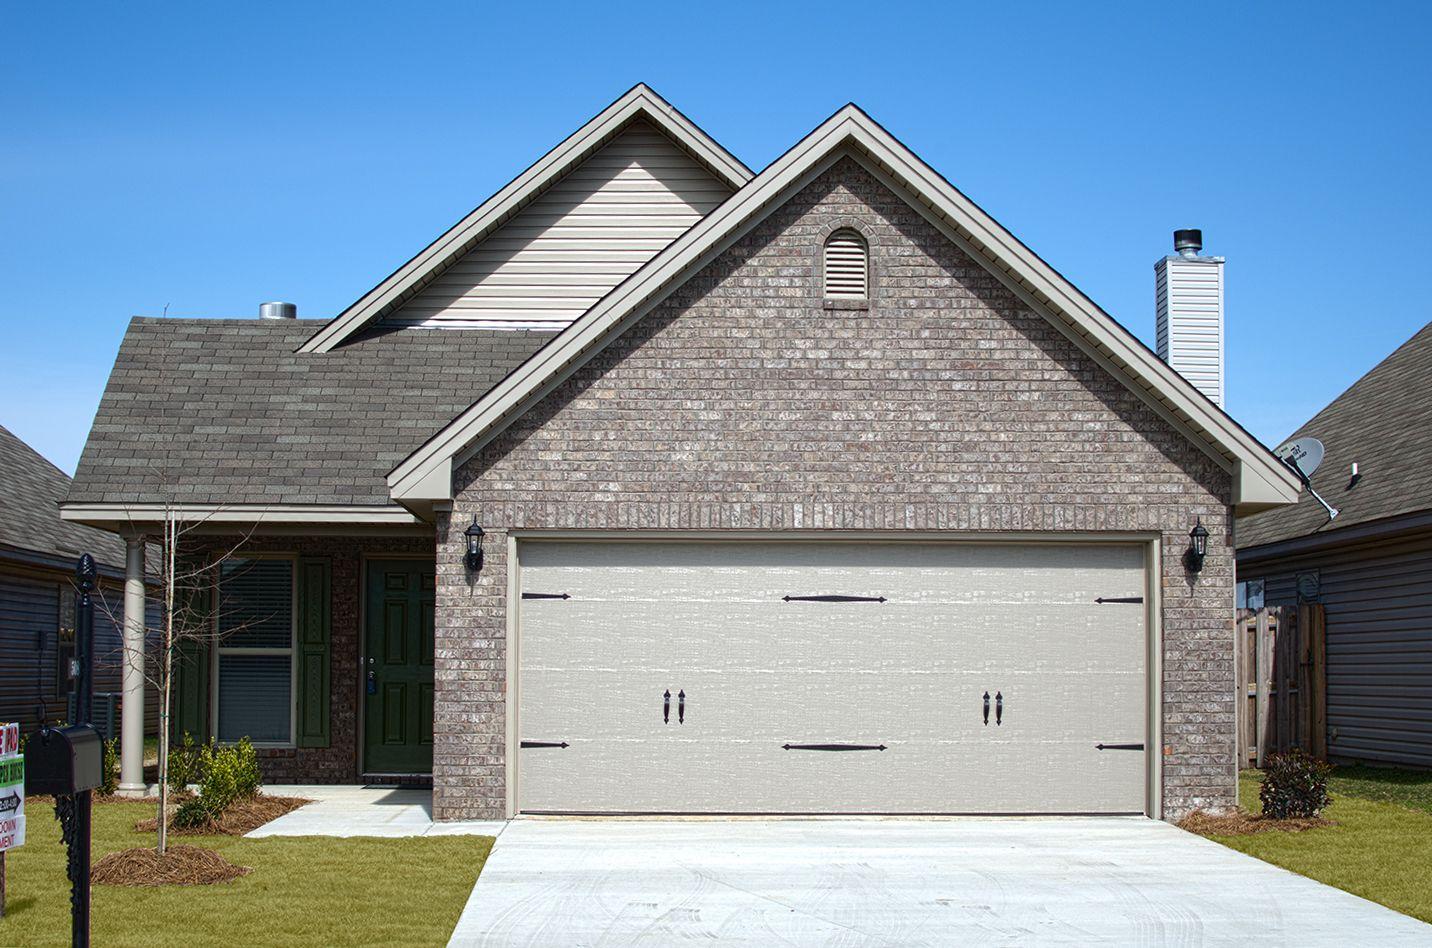 'Single Family' building or community at 'Park Lake 8553 Ridgeview Circle Montgomery, Alabama 36107 United States'